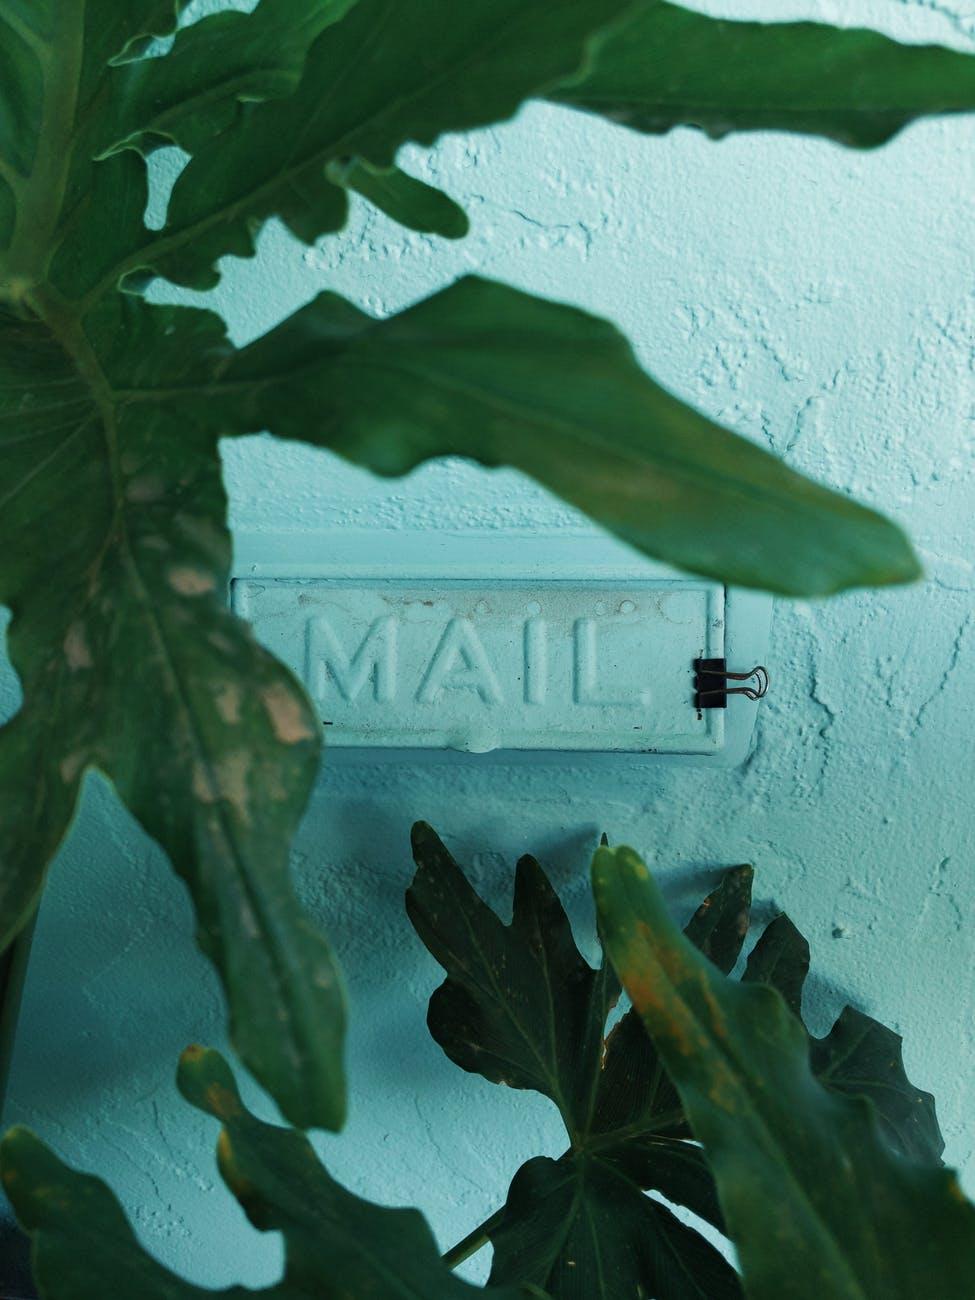 black binder clip near wall